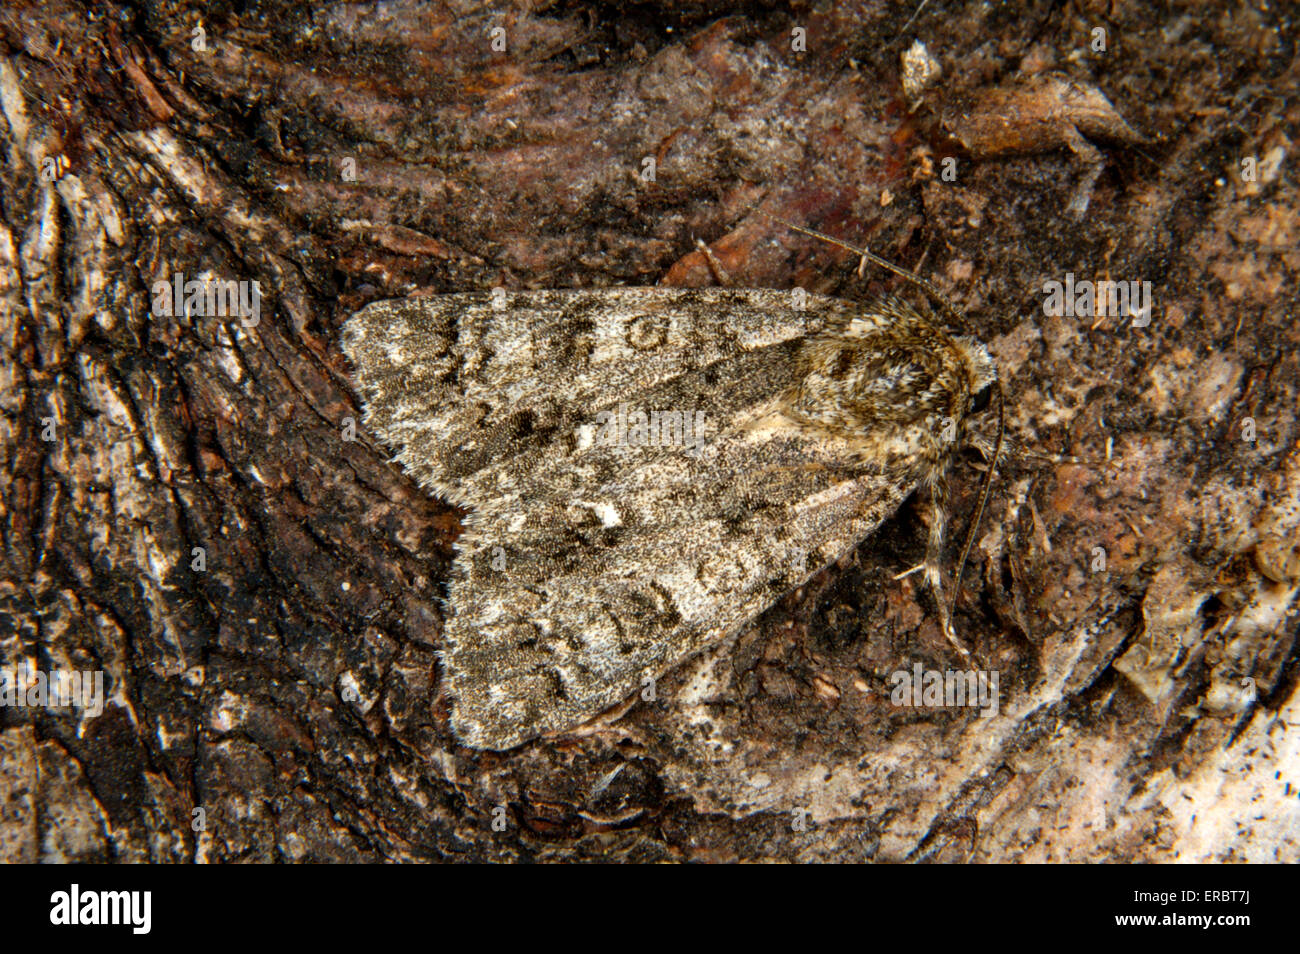 Knot Grass - Acronicta rumicis - Stock Image